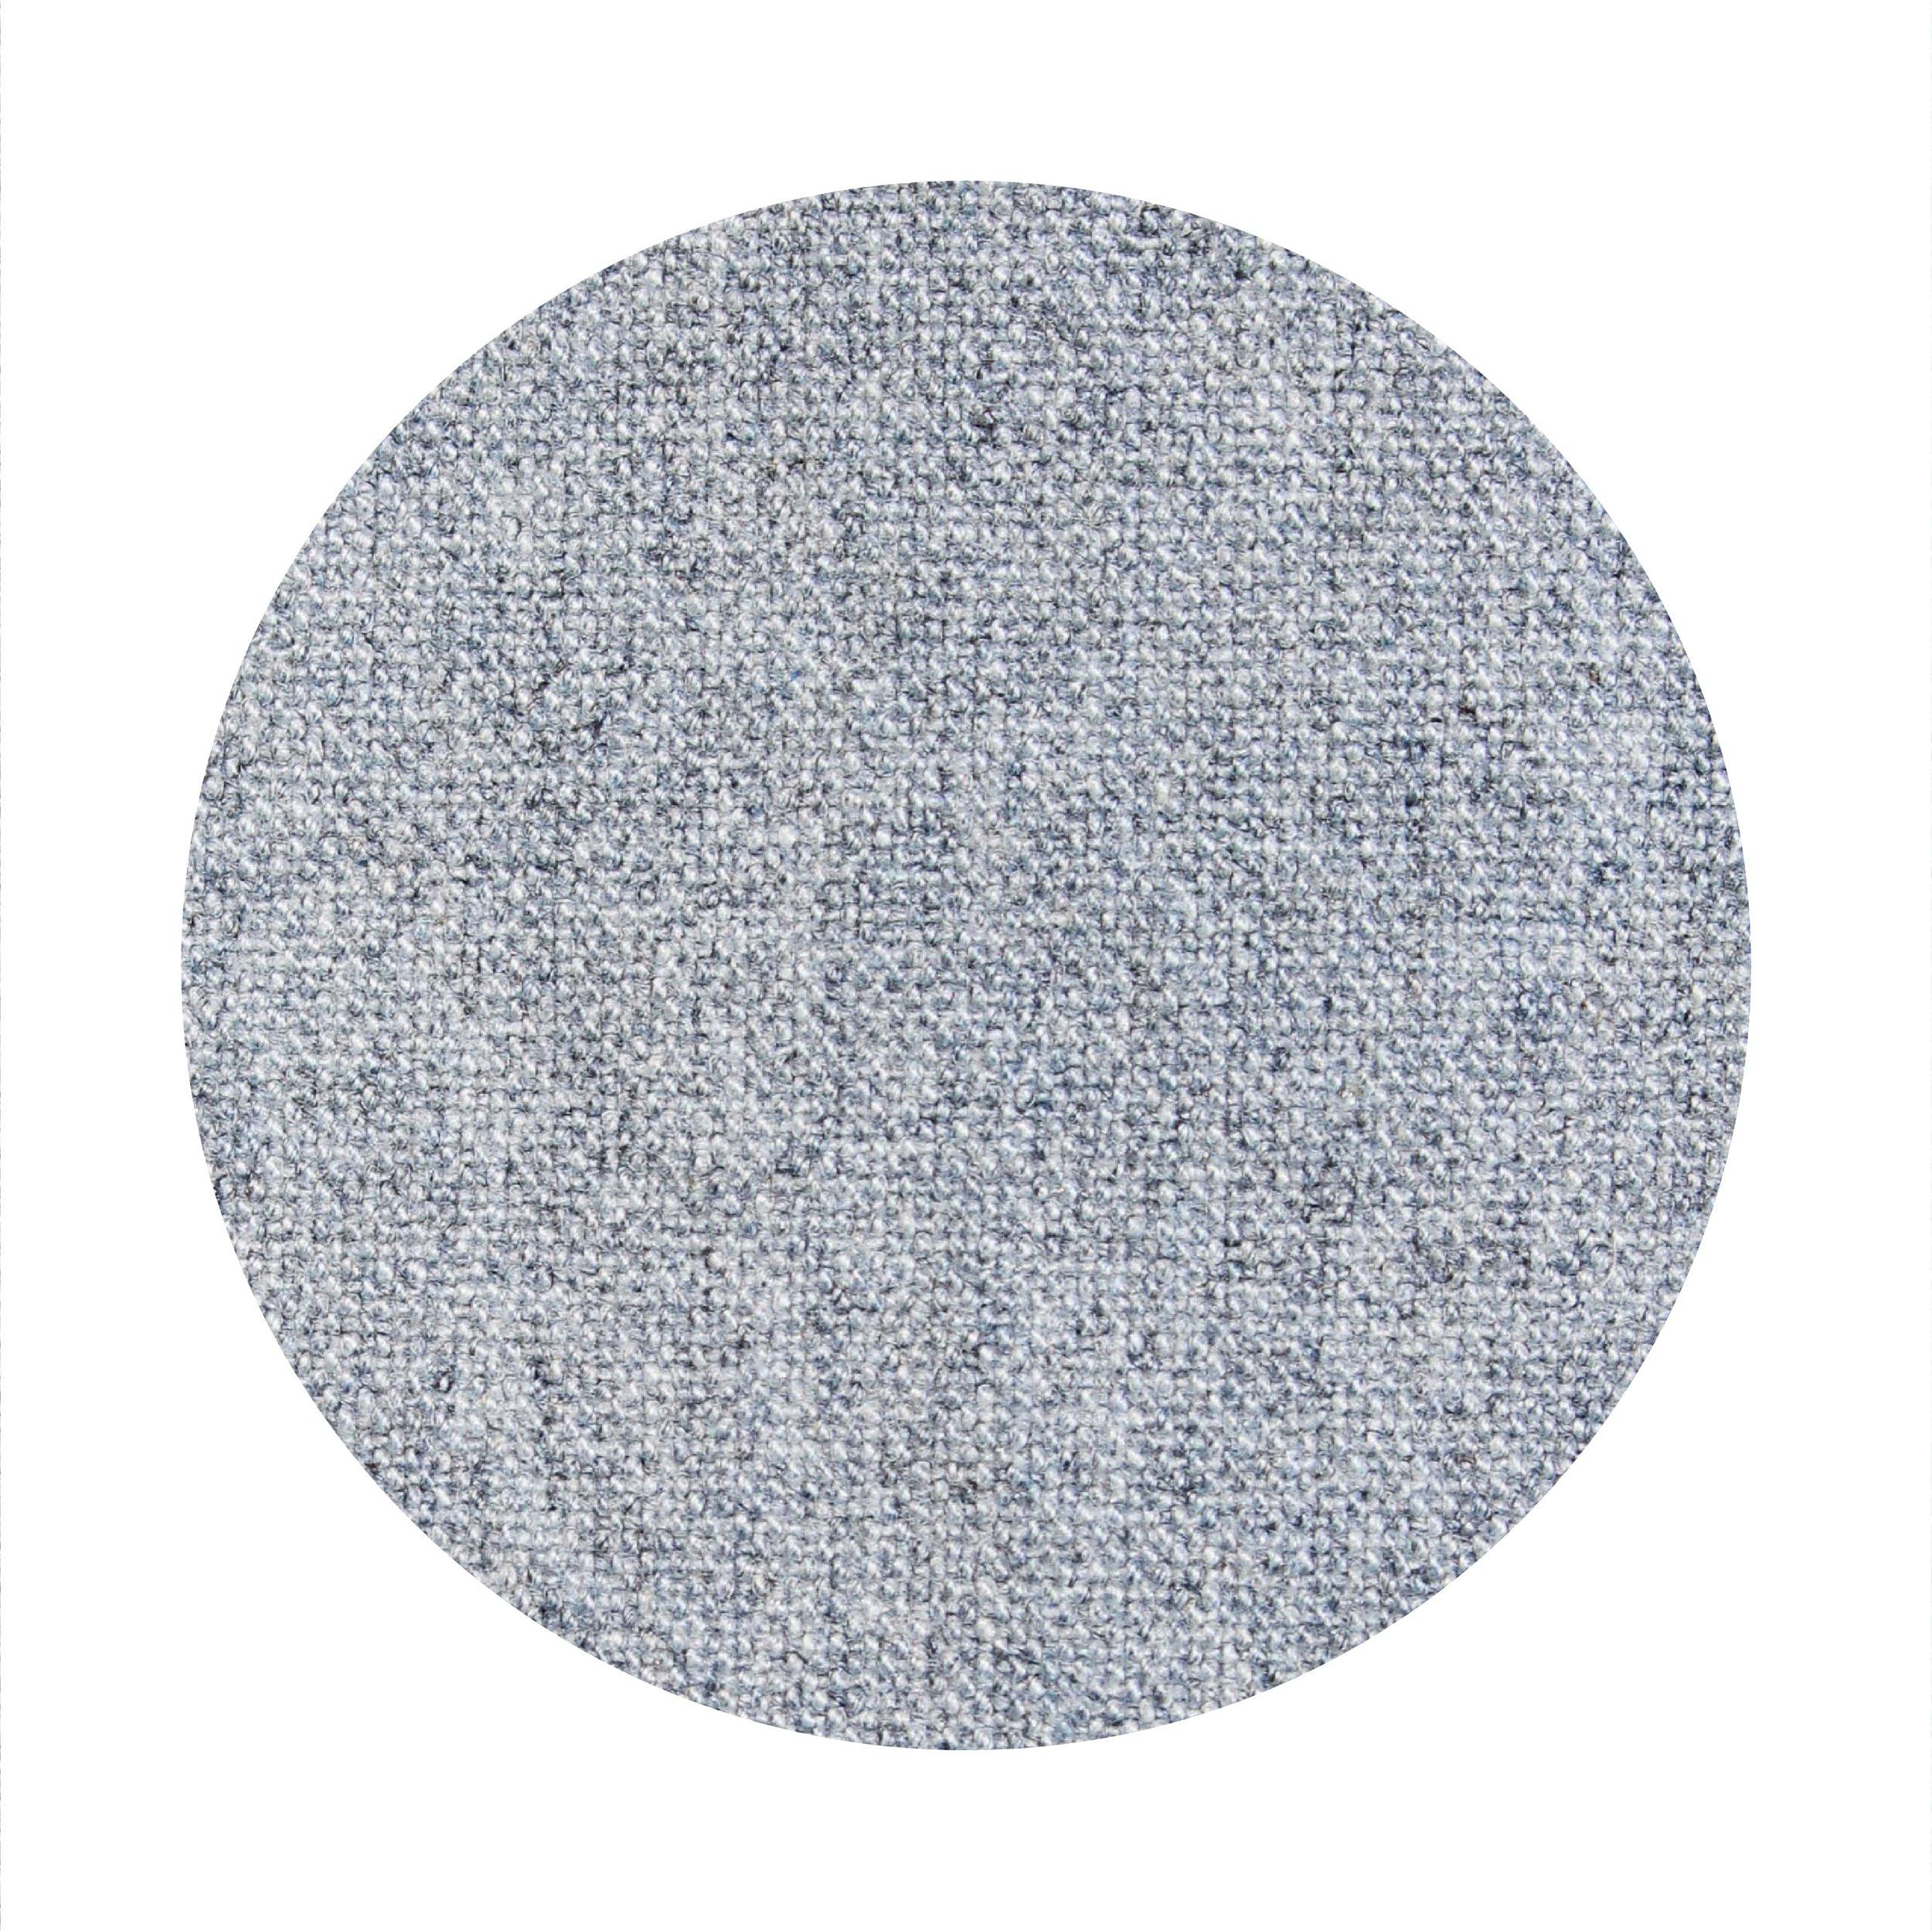 circle close ups rethink-02-min.jpg